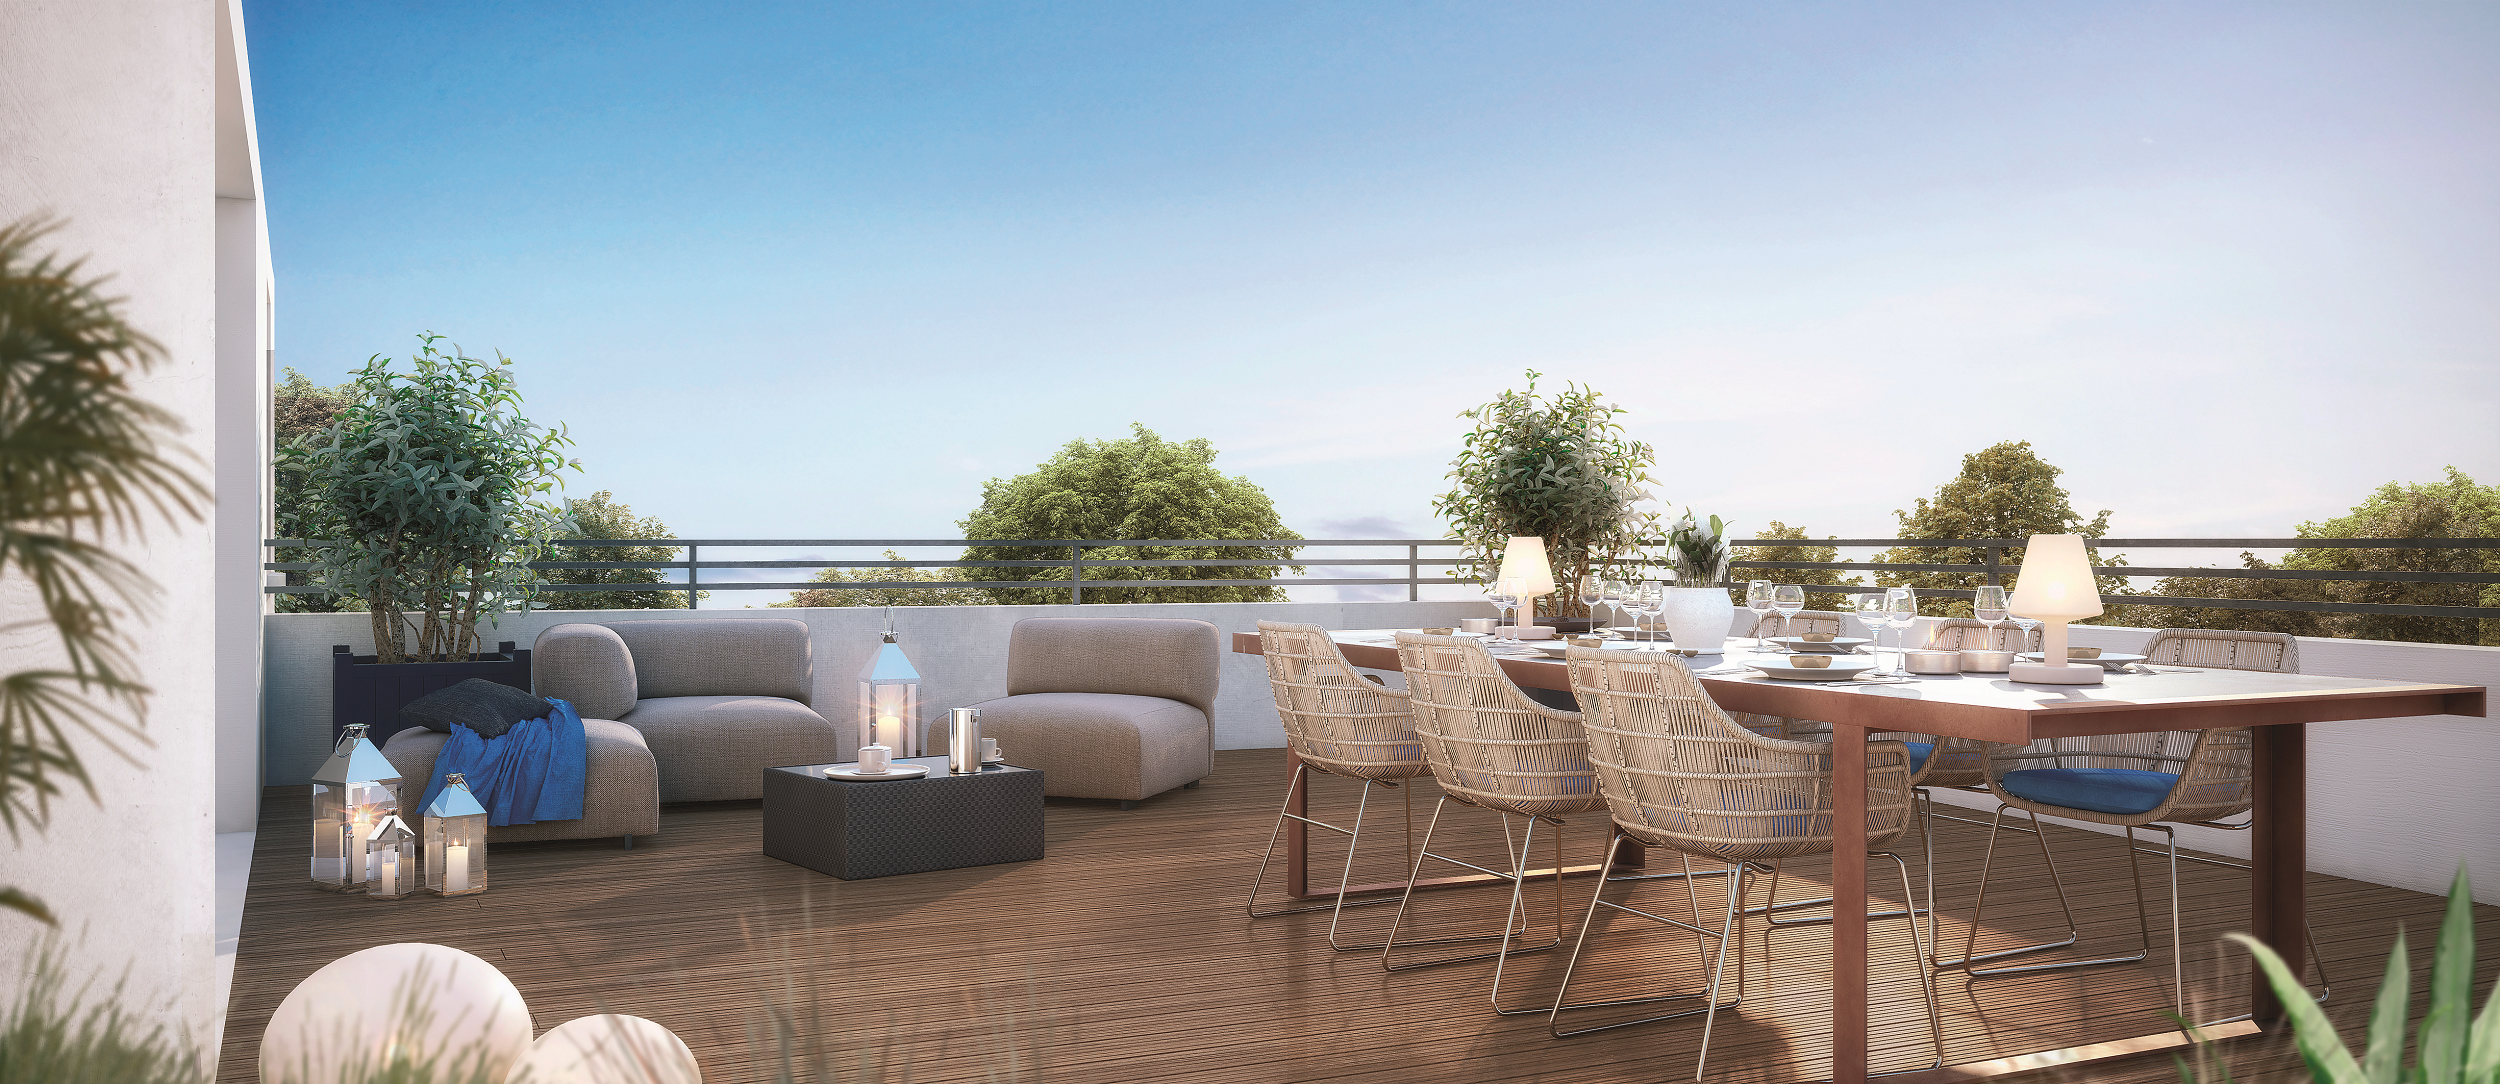 le clos d 39 emilie green city immobilier. Black Bedroom Furniture Sets. Home Design Ideas